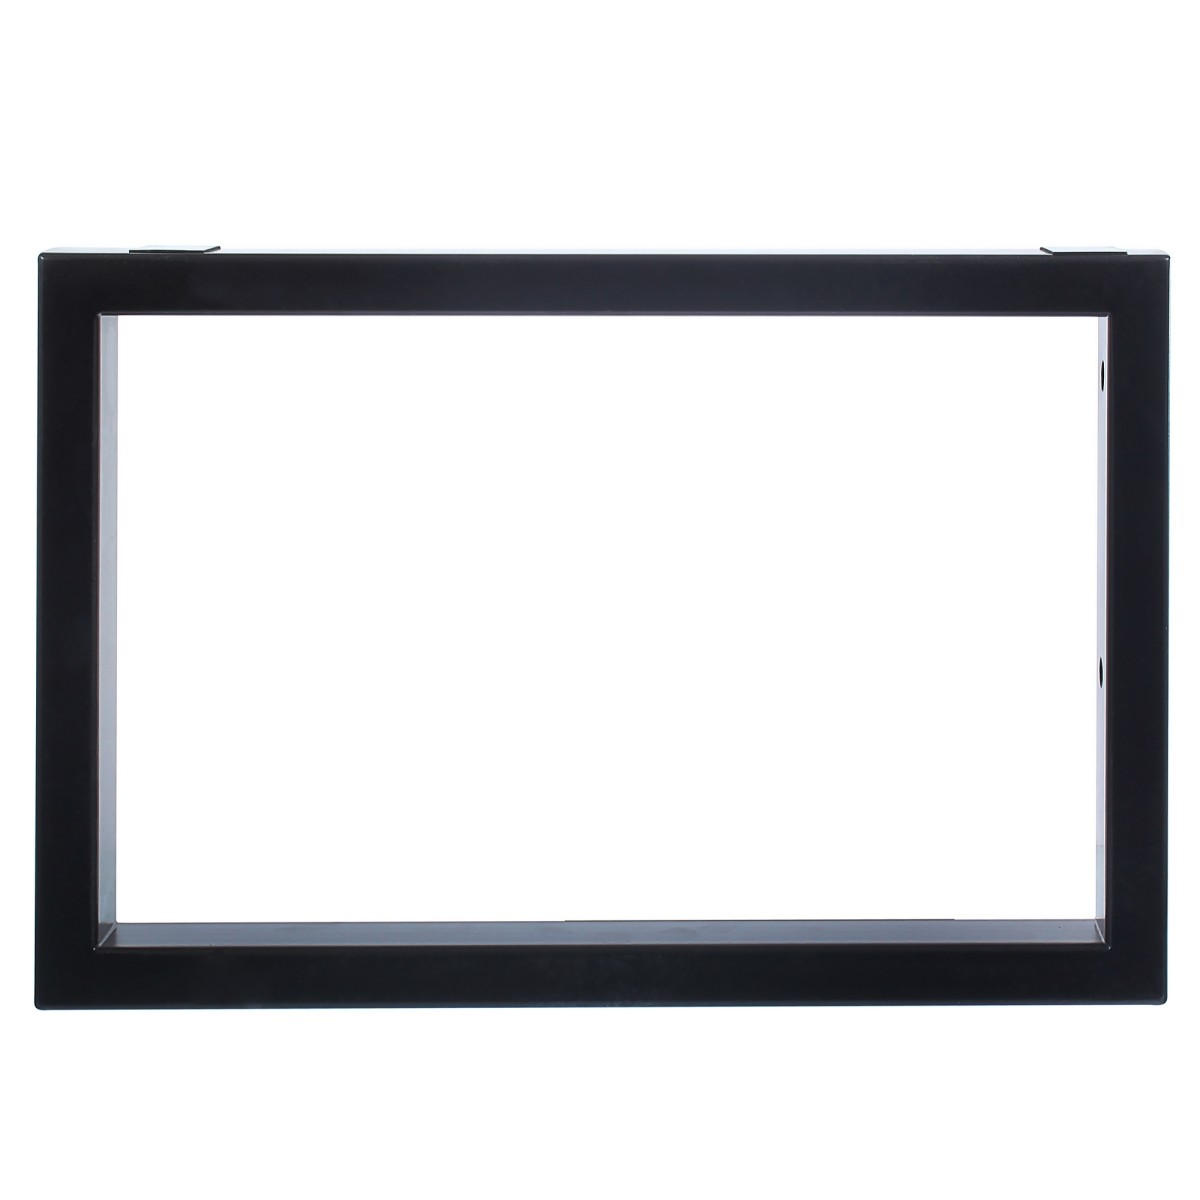 Кронштейн подвесной 450х300 мм цвет черный 2 шт.